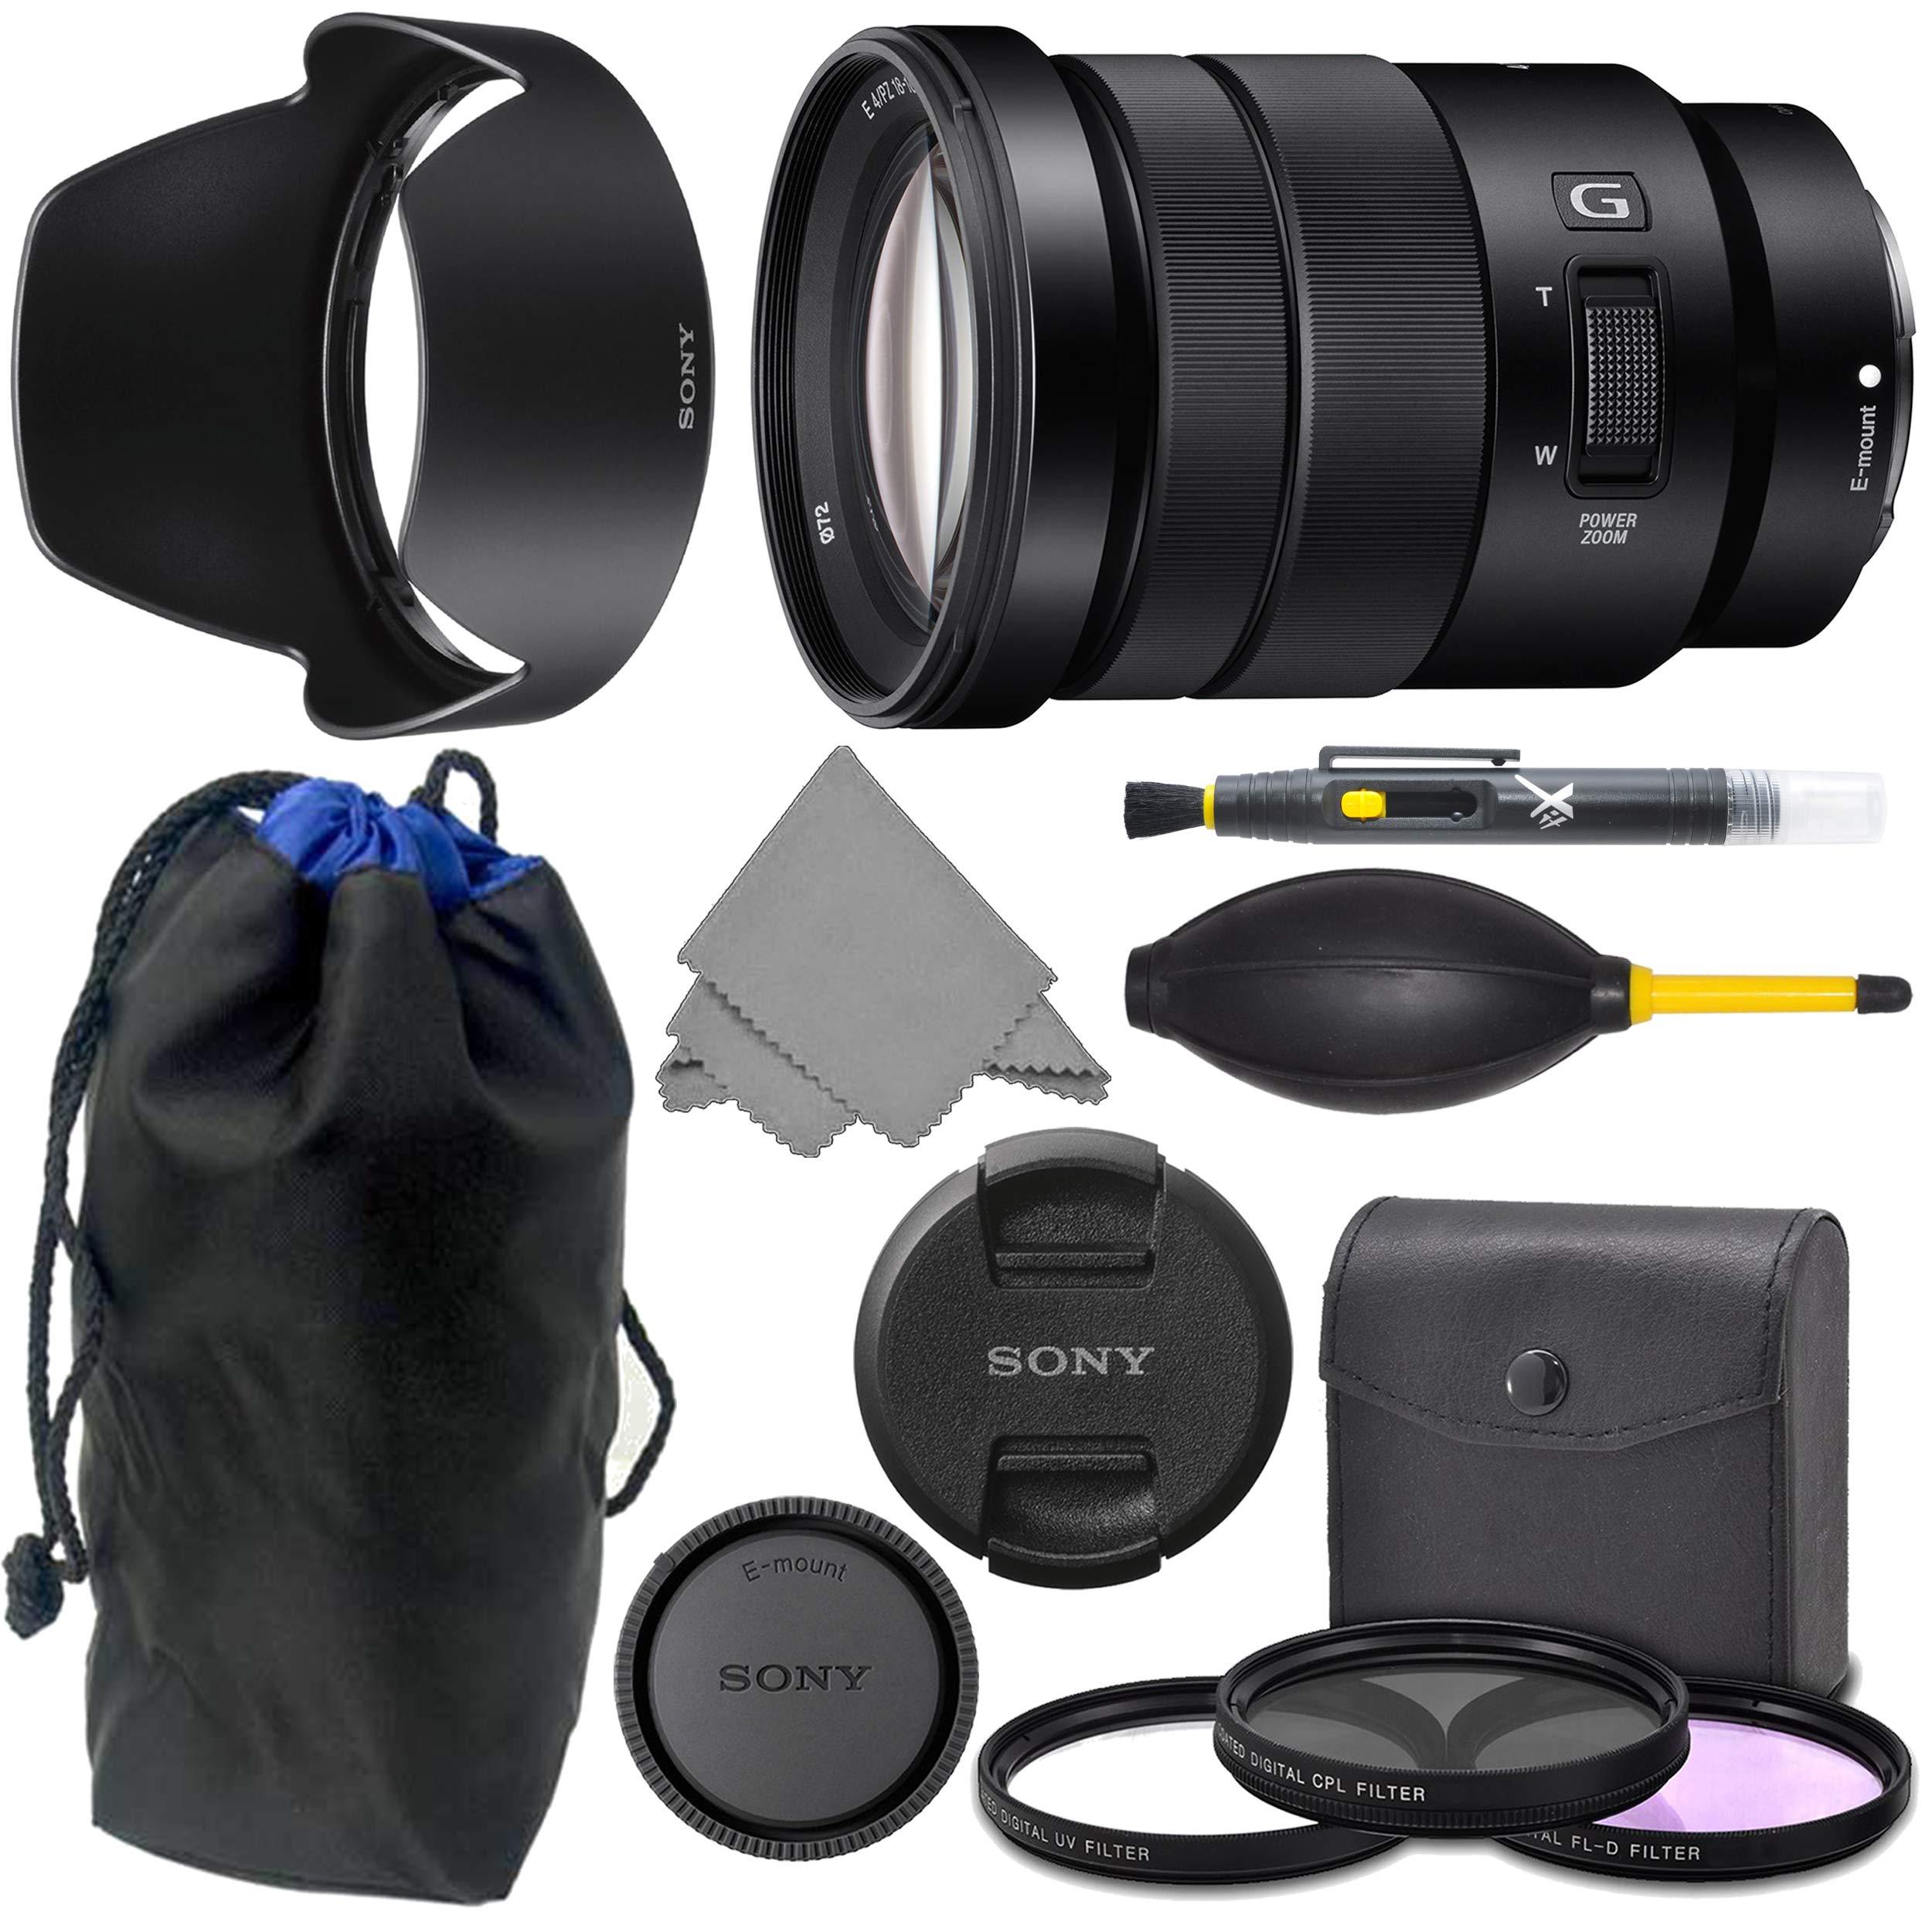 Sony E 18-105mm f4 SELP18105G: Sony E PZ 18-105mm f/4 G OSS Lens + AOM Pro Kit Combo Bundle - International Version (1 Year AOM Warranty) by AOM